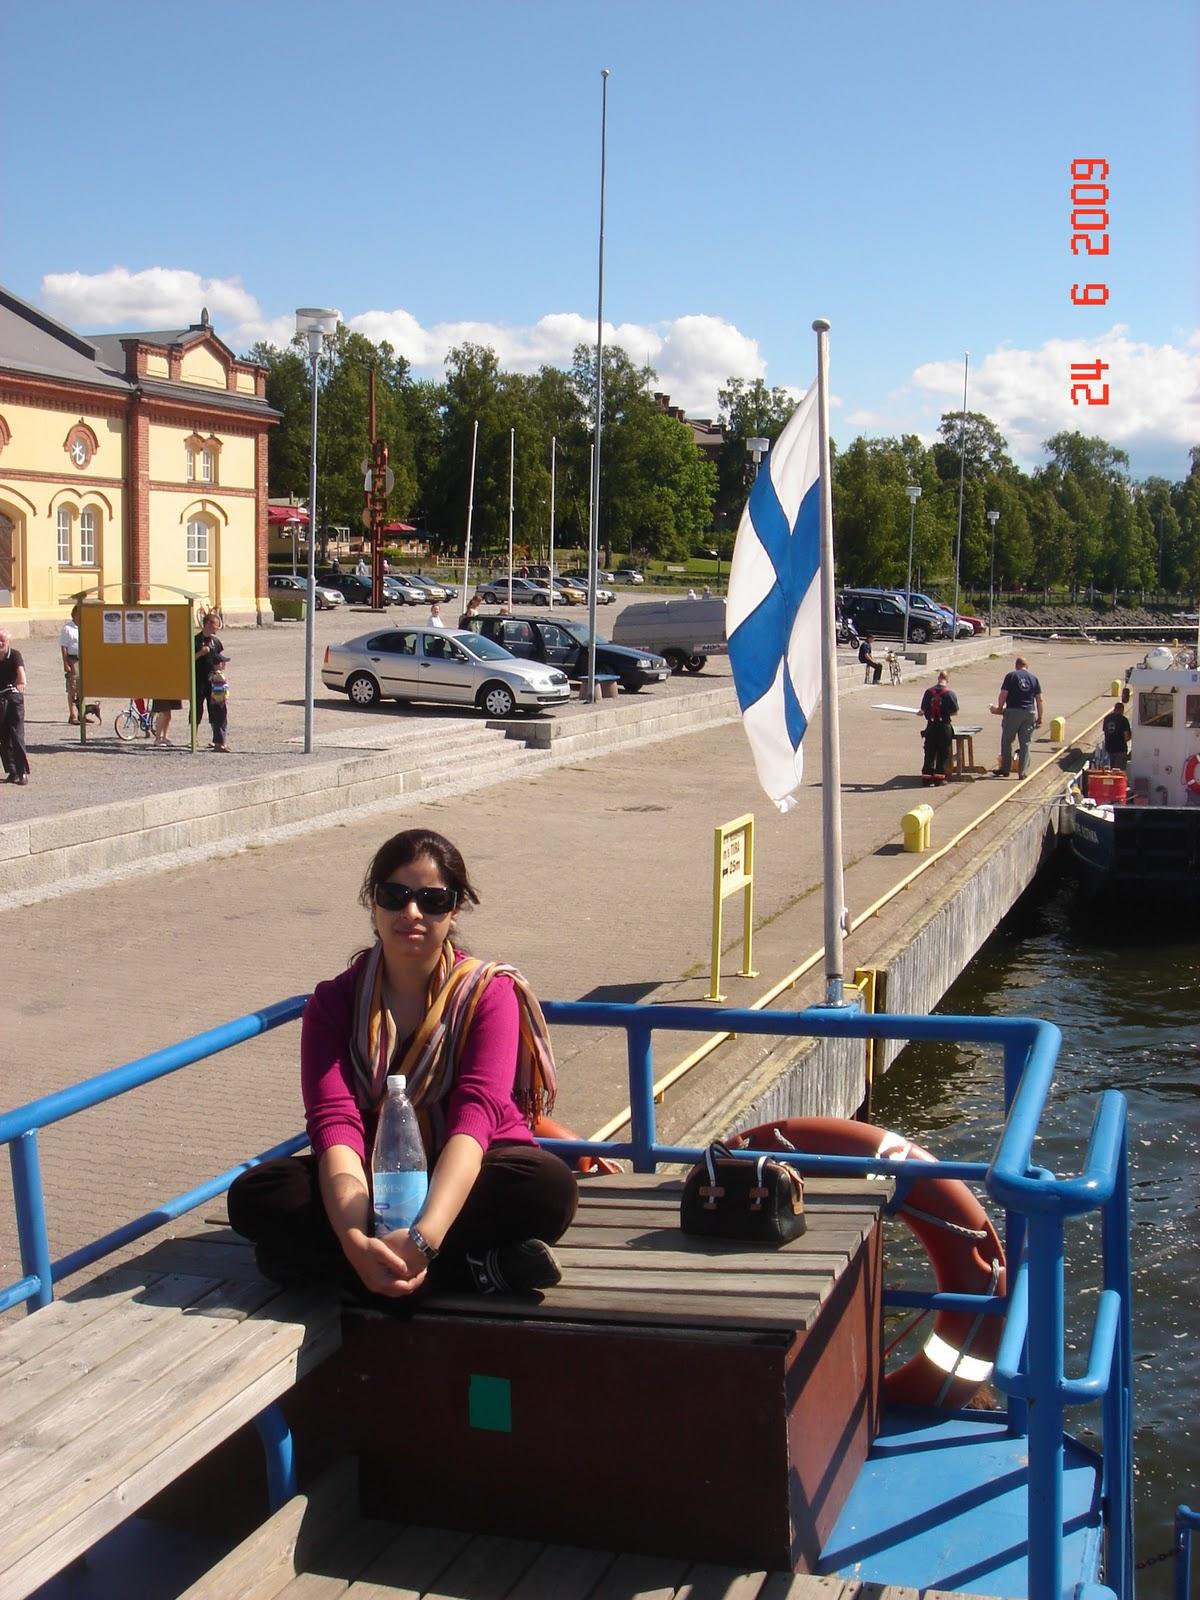 Kalaranta Passenger Quay,Vaasa,Finland